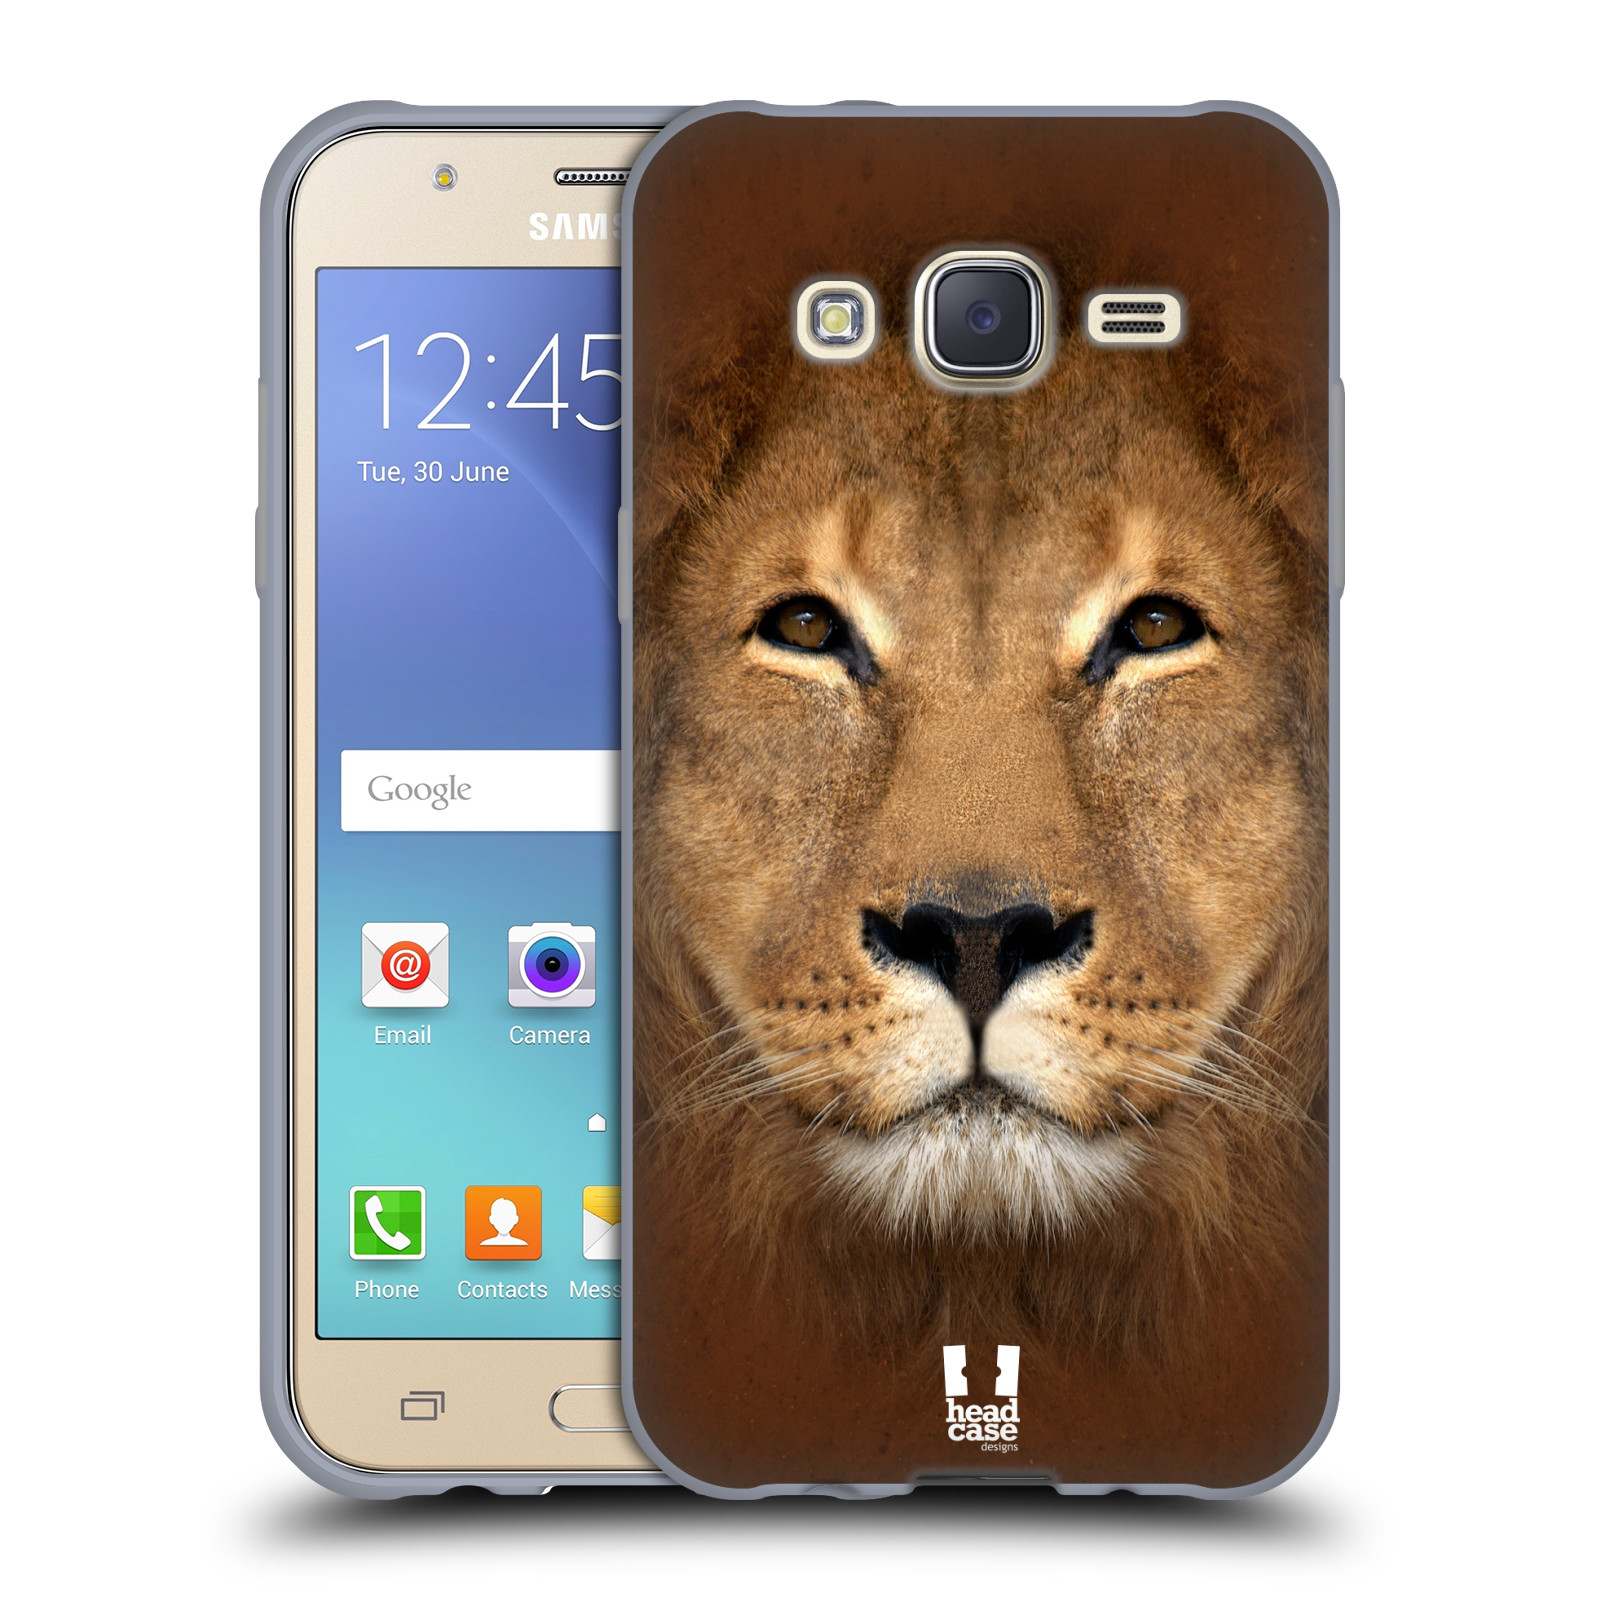 HEAD CASE silikonový obal na mobil Samsung Galaxy J5, J500, (J5 DUOS) vzor Zvířecí tváře 2 Lev